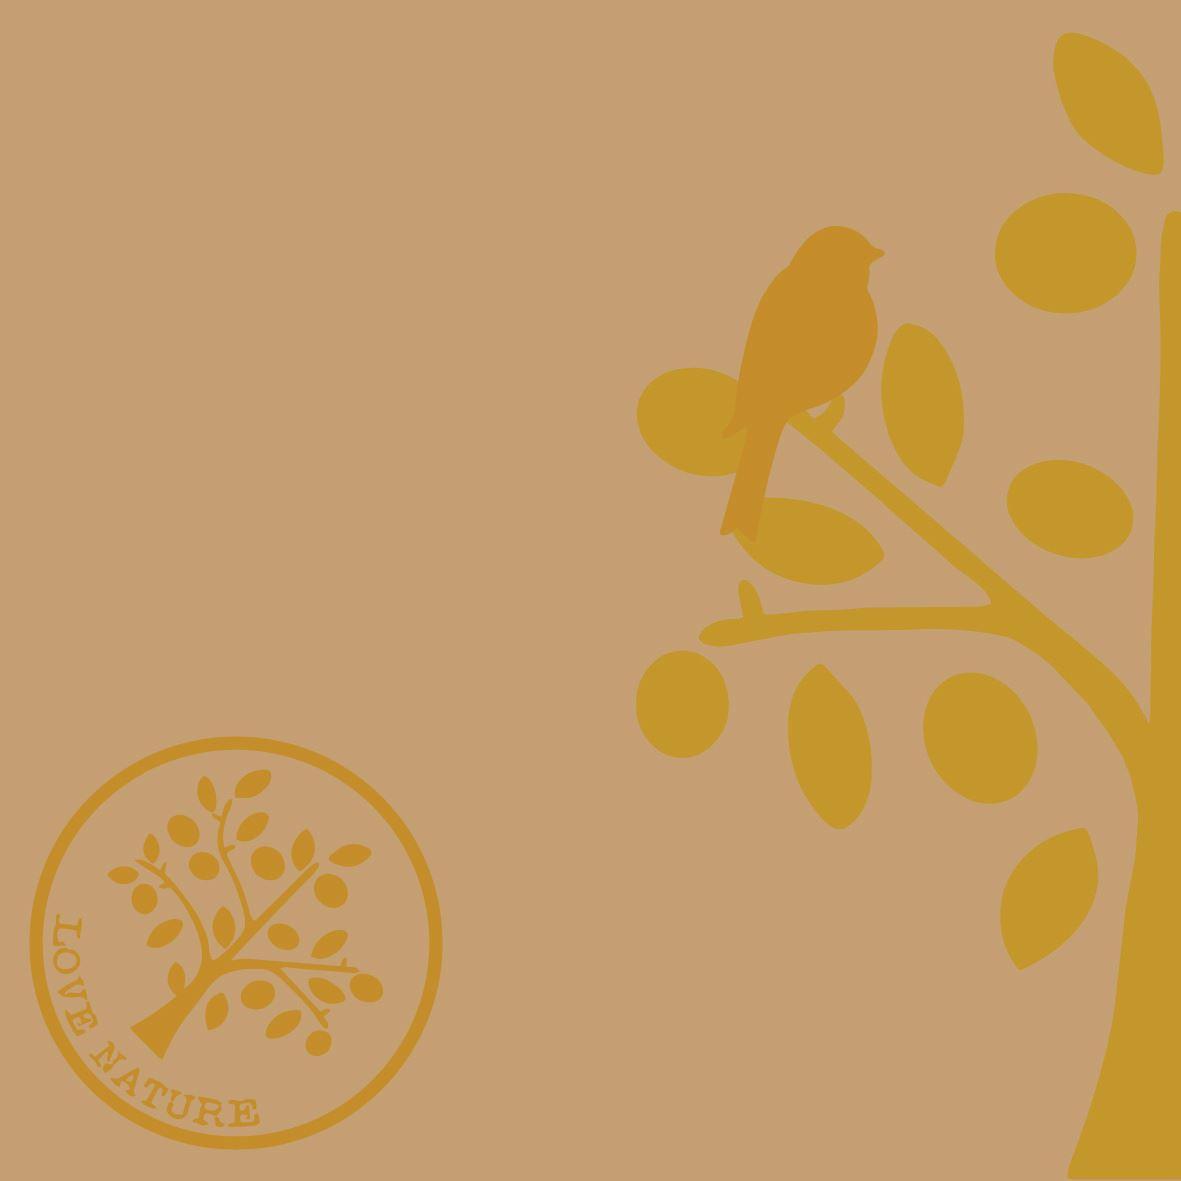 Linclass napkins 40x40 cm - Love Nature-Baum  (naturbraun)